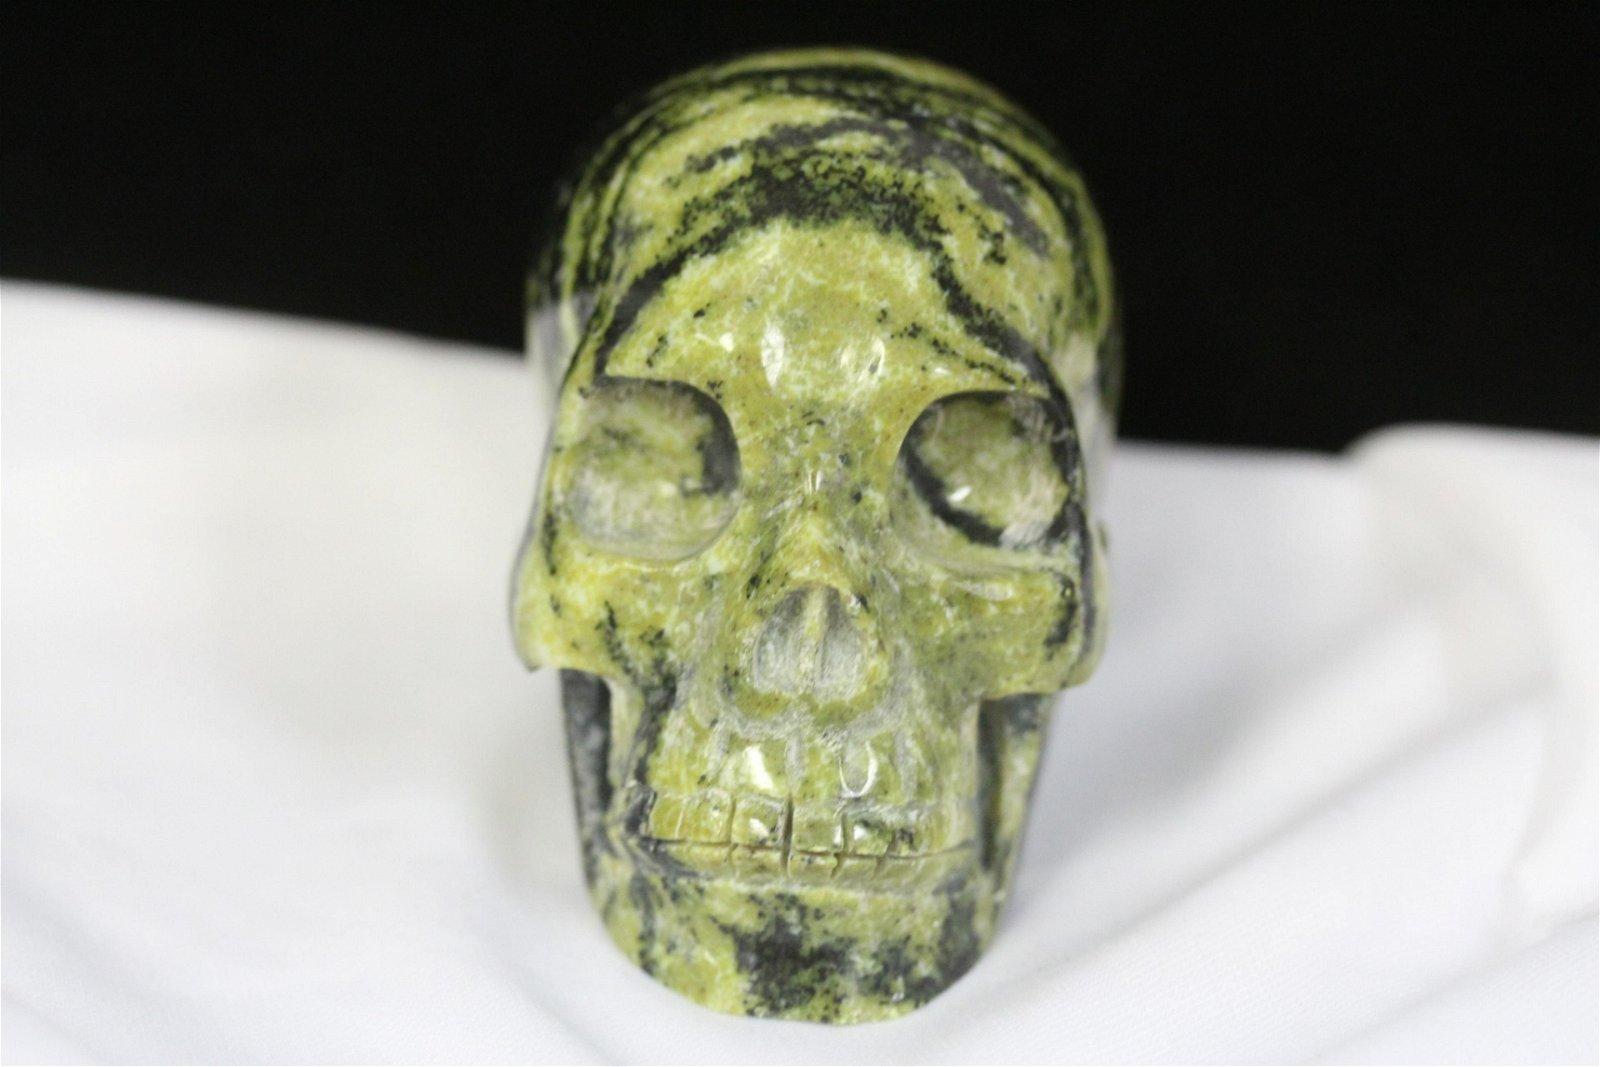 A Jade or Hardstone Skull